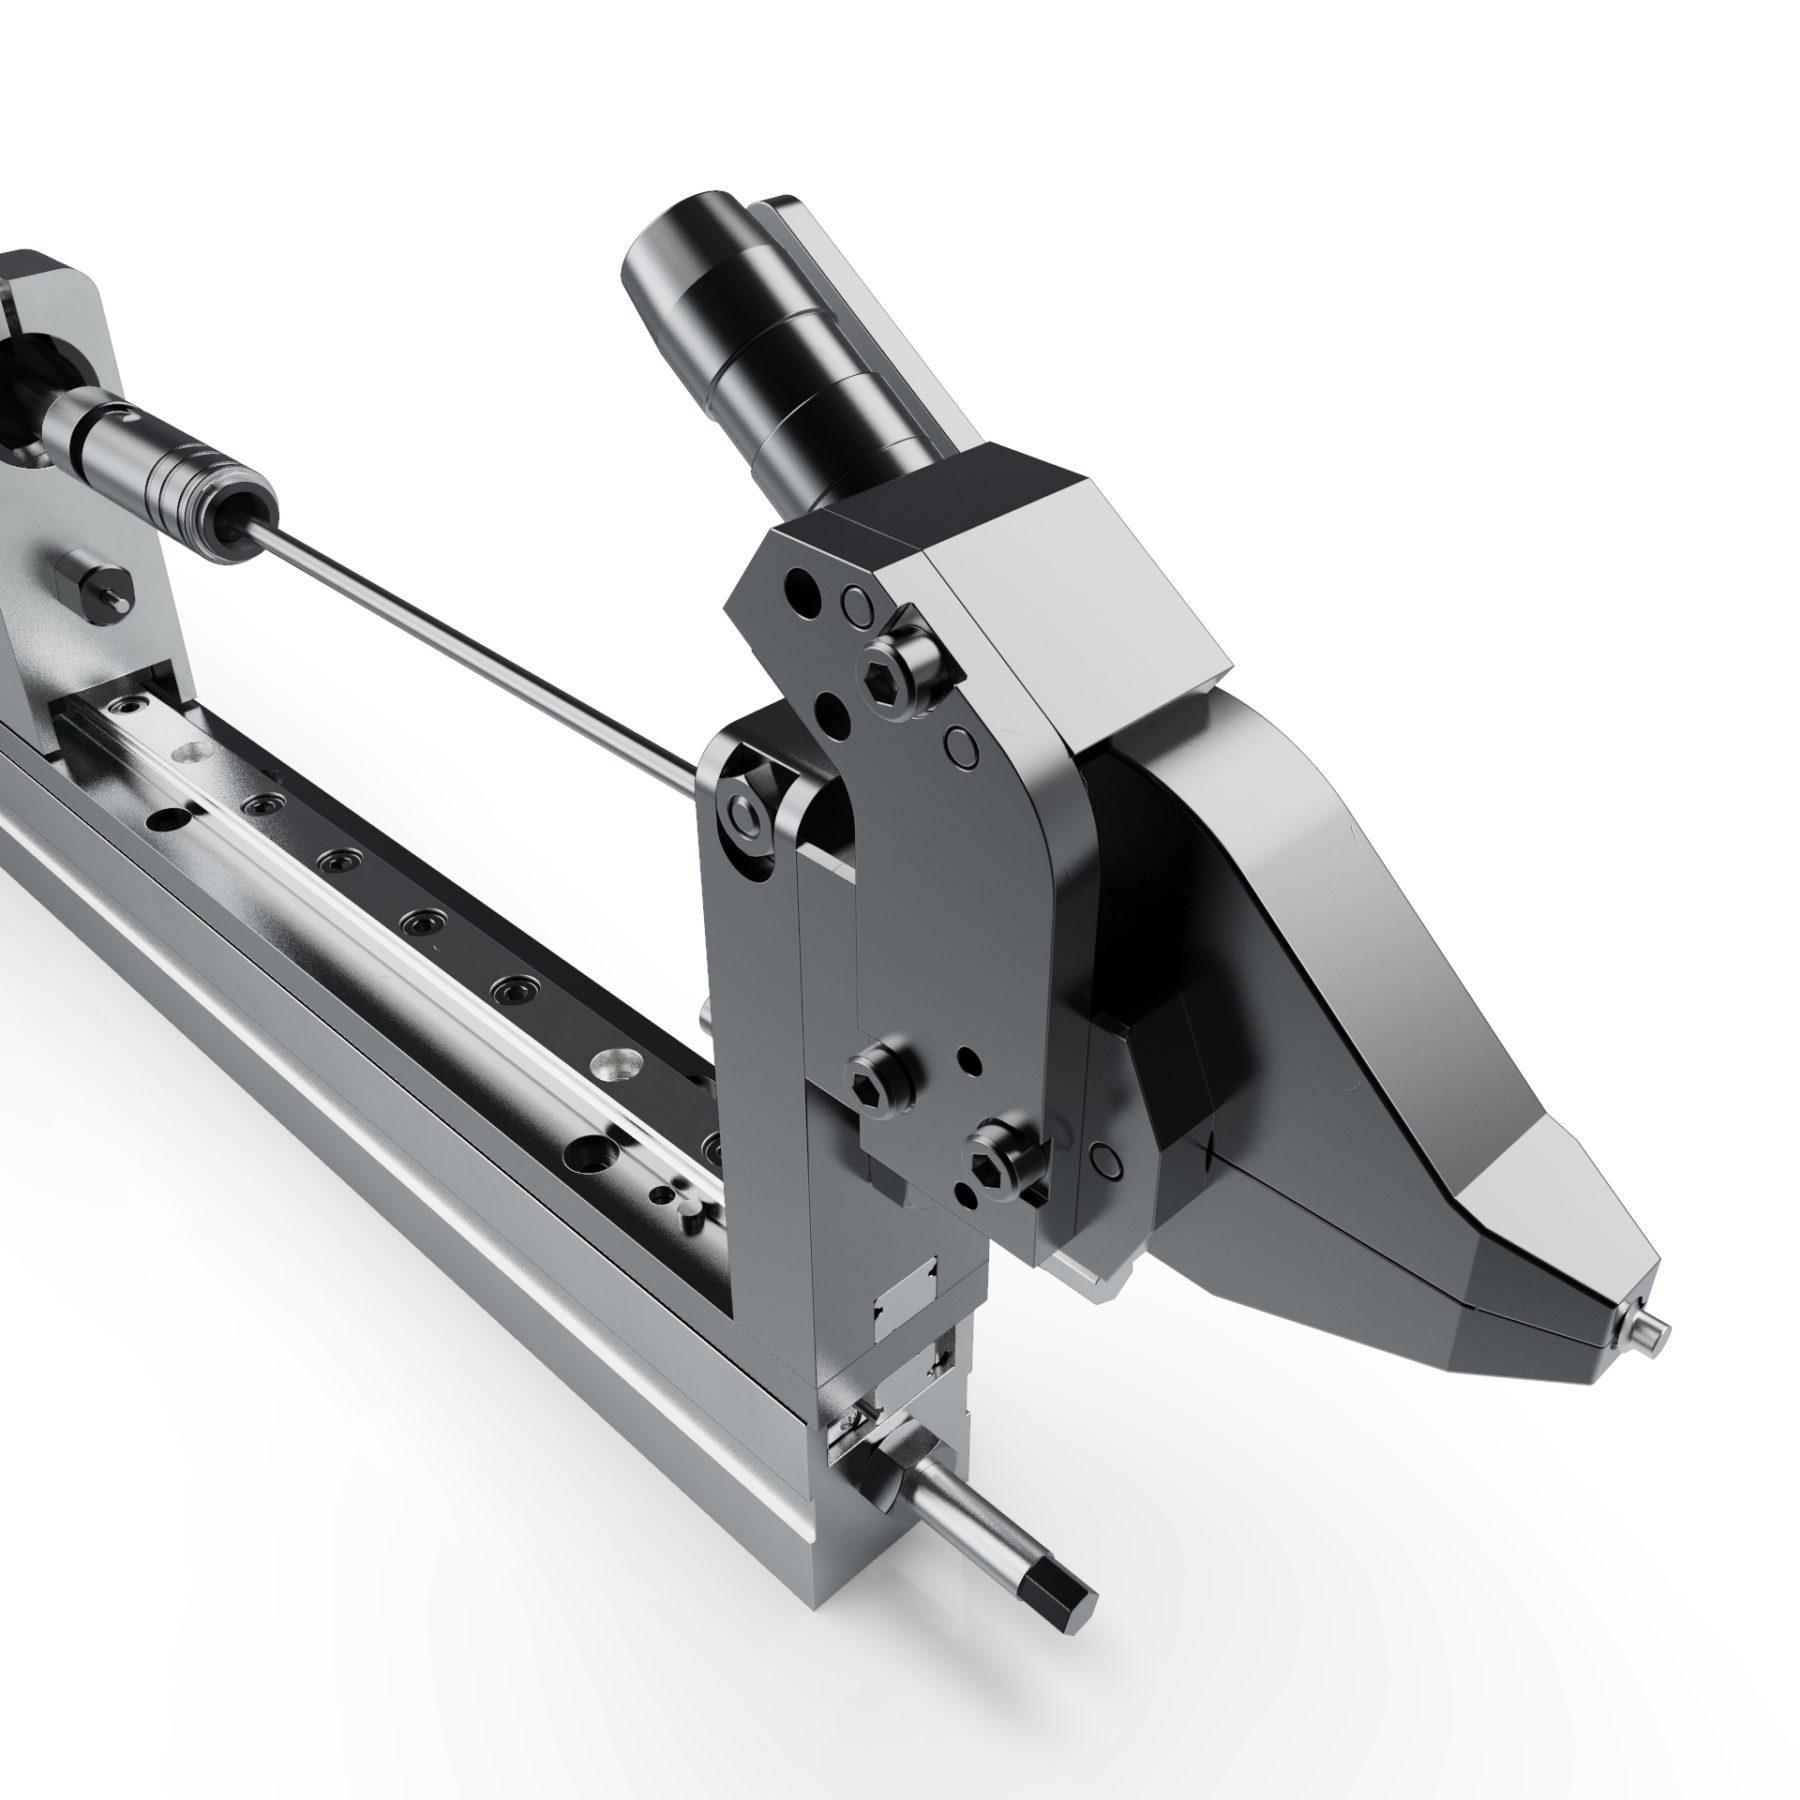 MiniMod Mini Automatic Screwdriver Head Type 1 Side 1